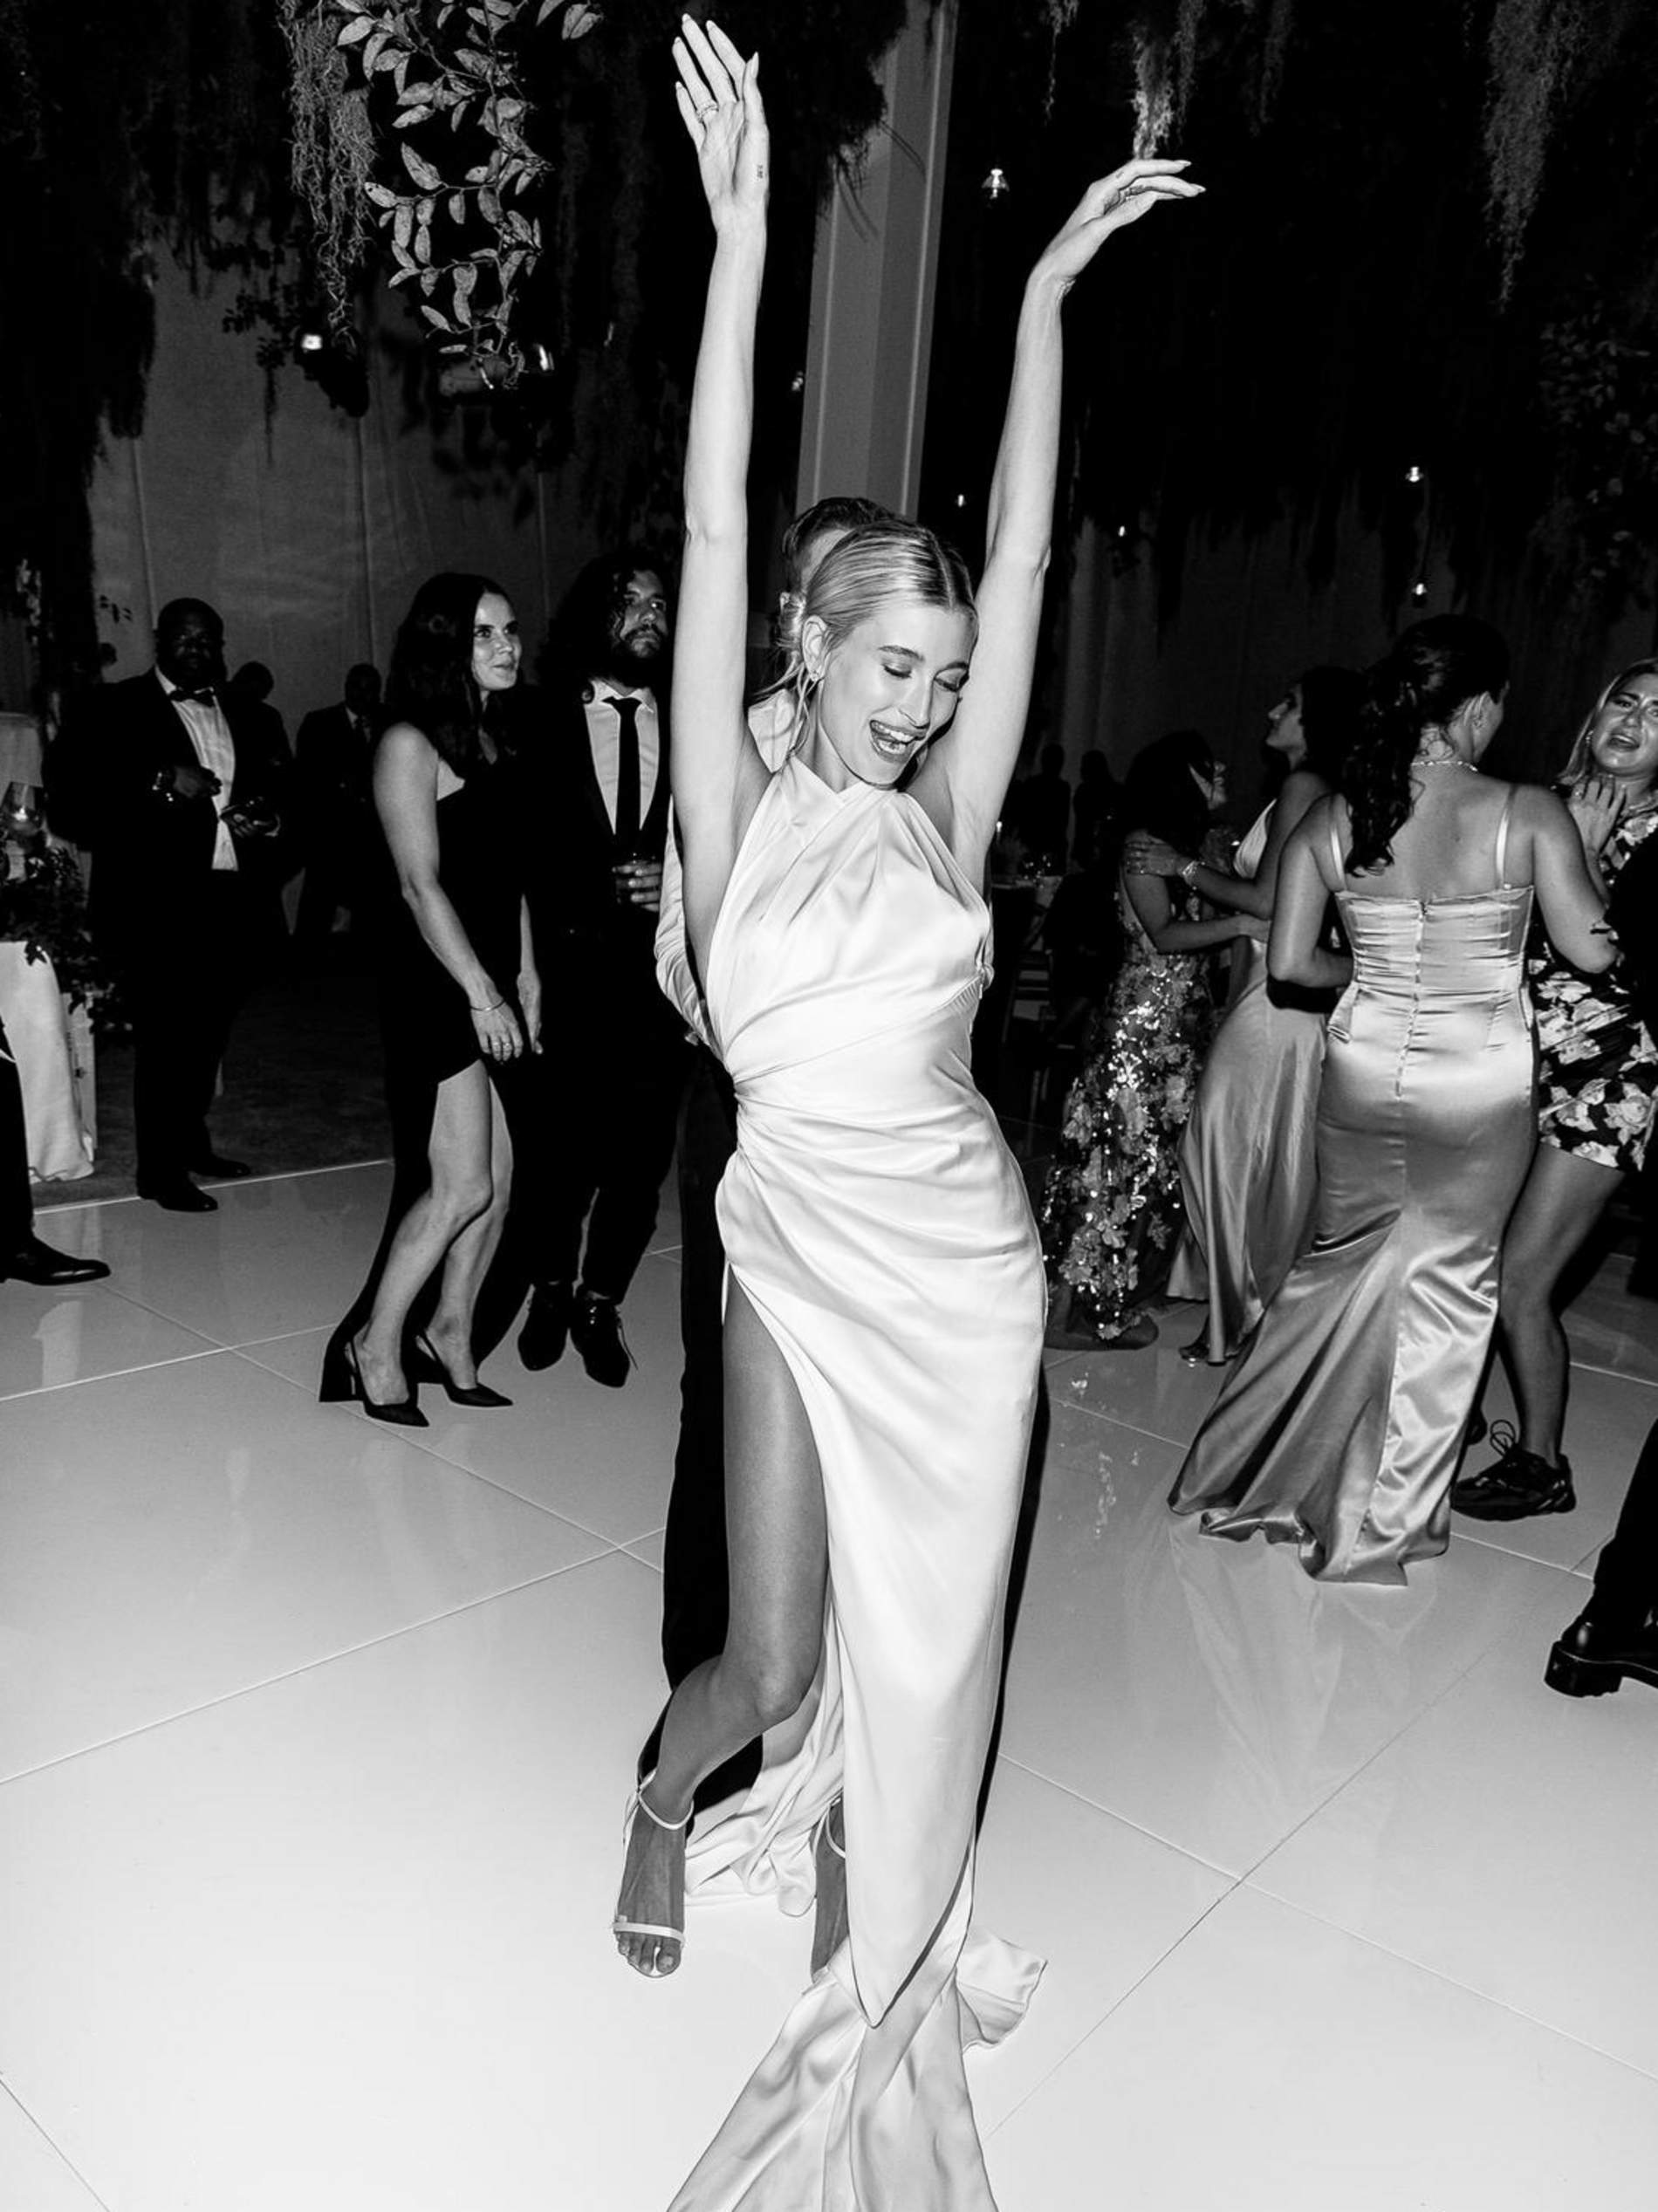 Best Celebrity Wedding Dresses From Meghan Markle To Jackie